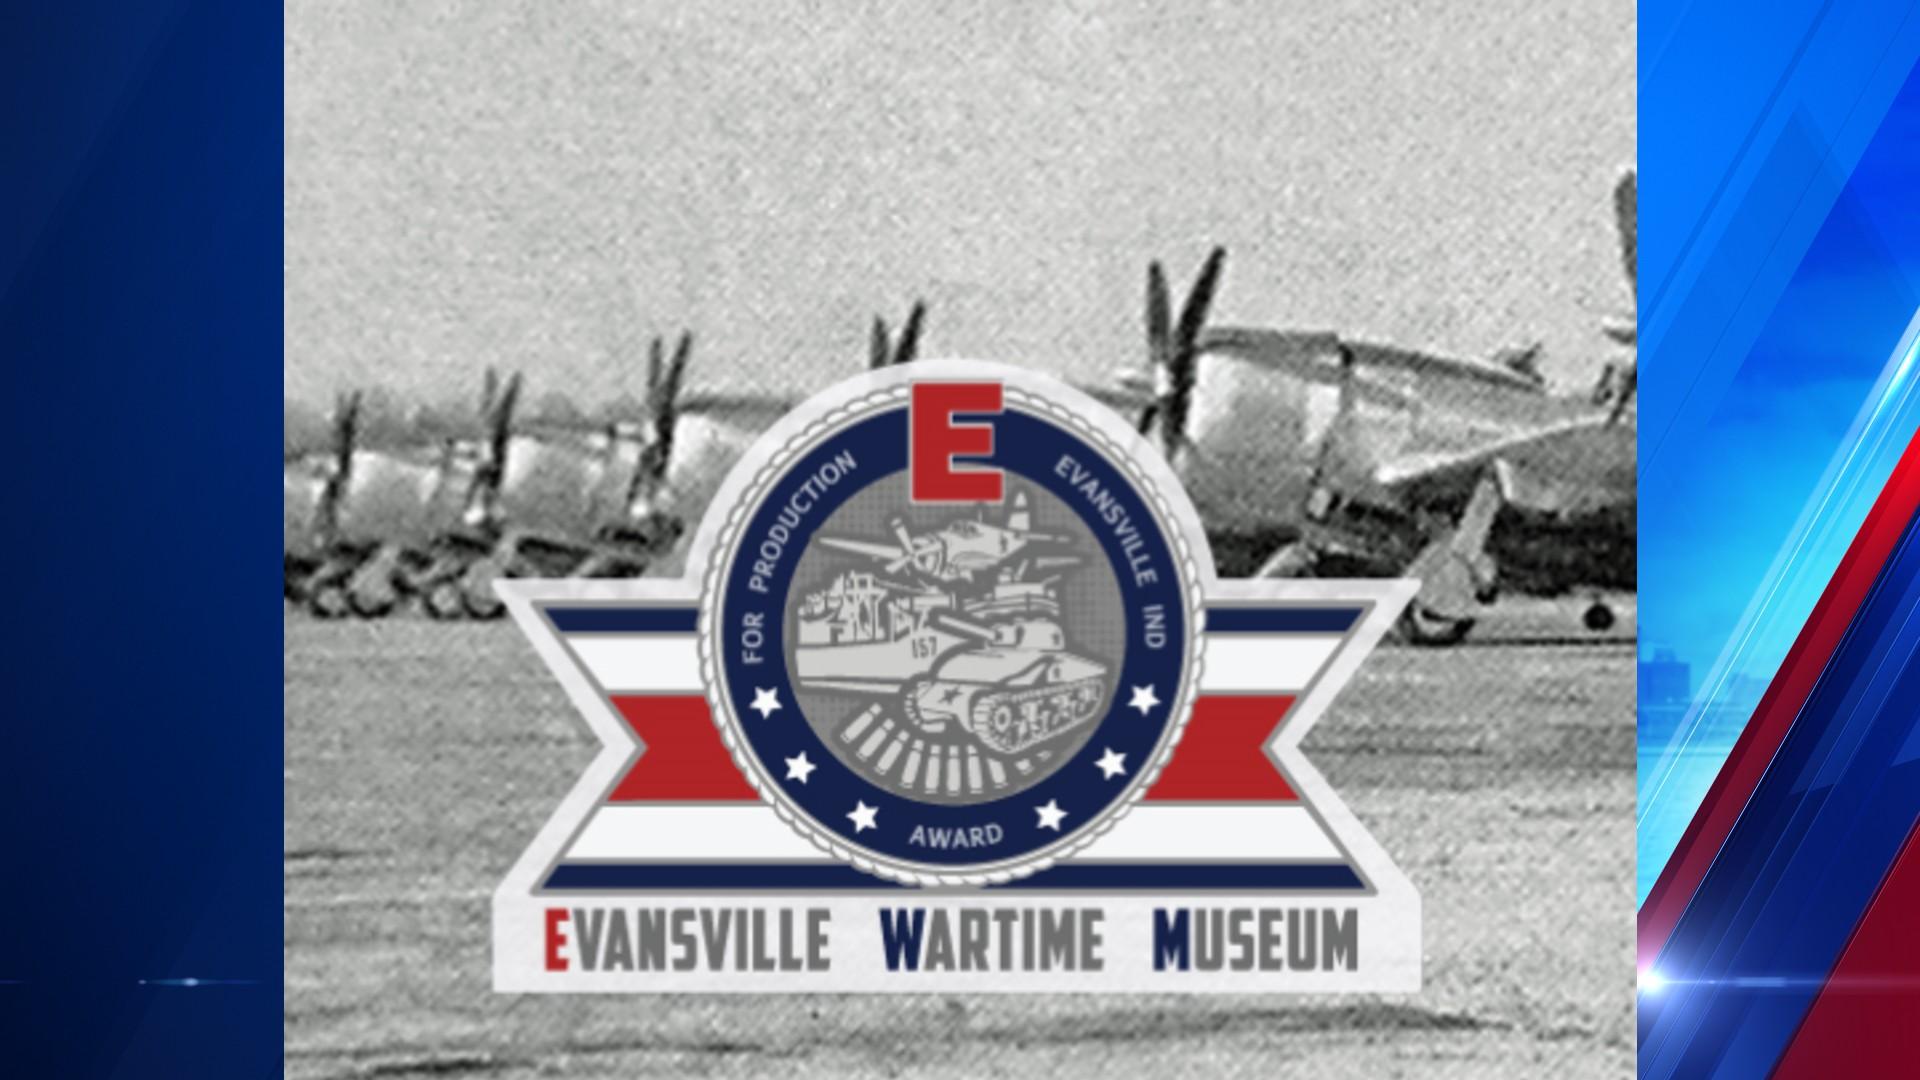 Evansville Wartime Museum